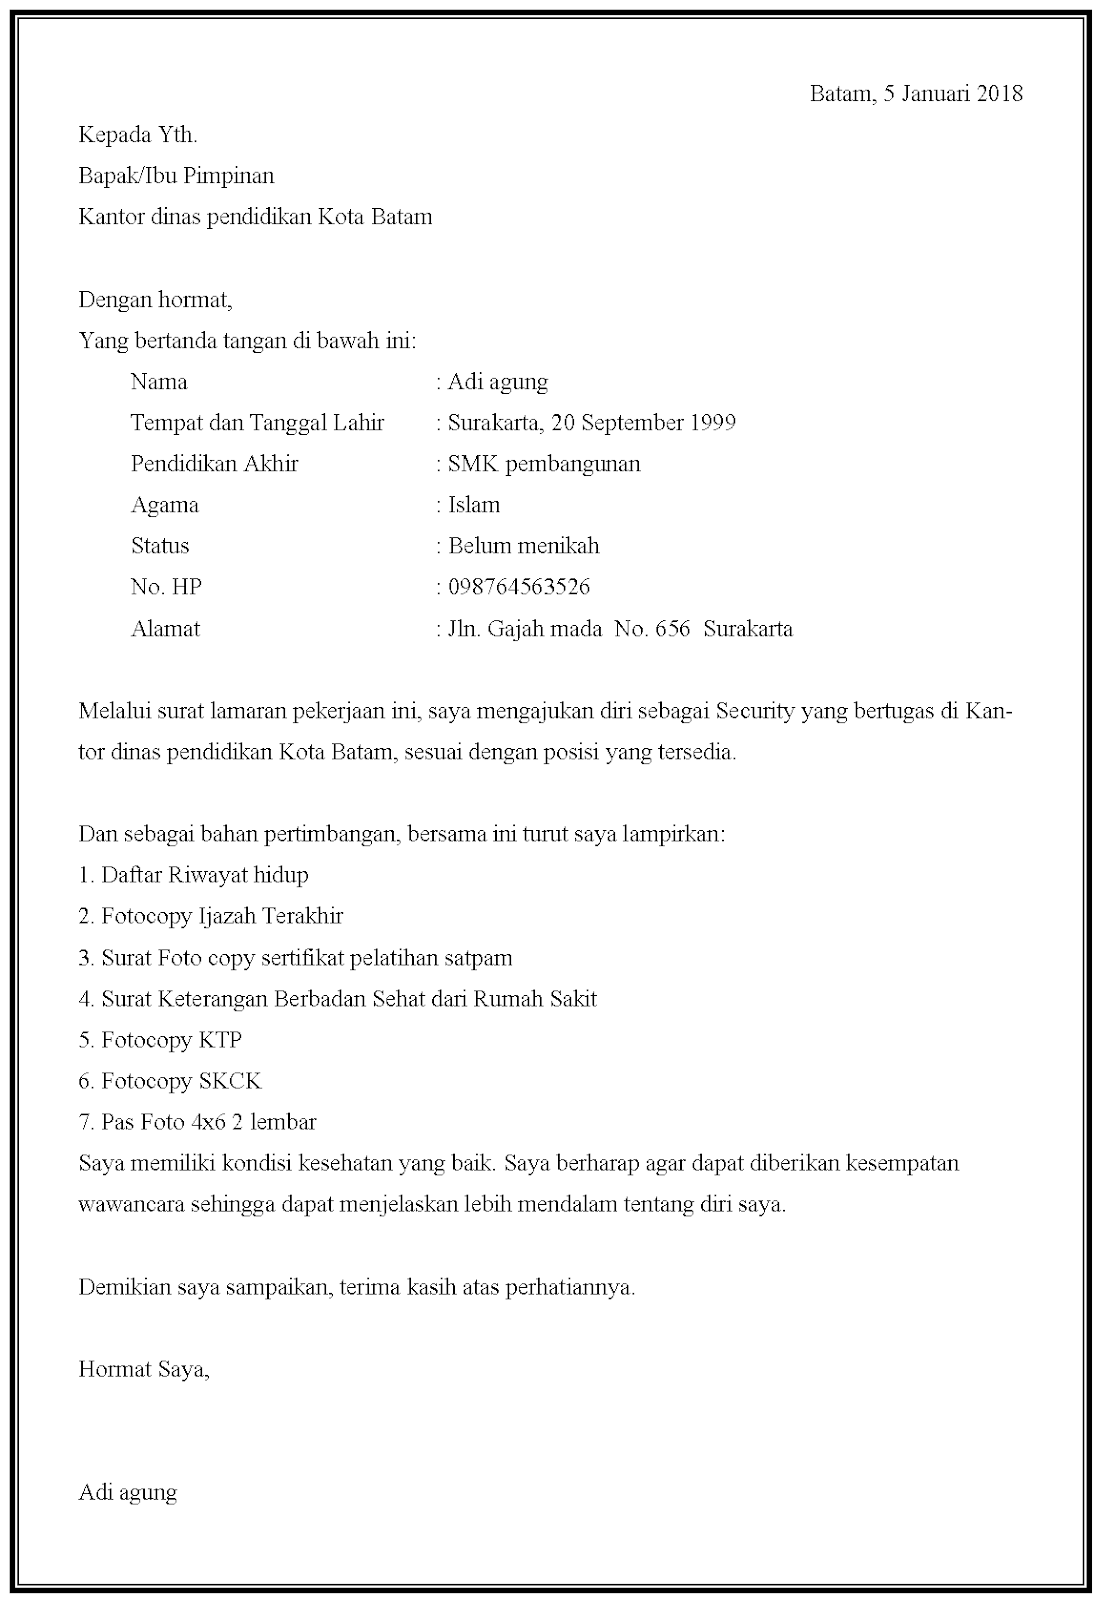 Contoh surat lamaran kerja security di kantor dinas pendidikan